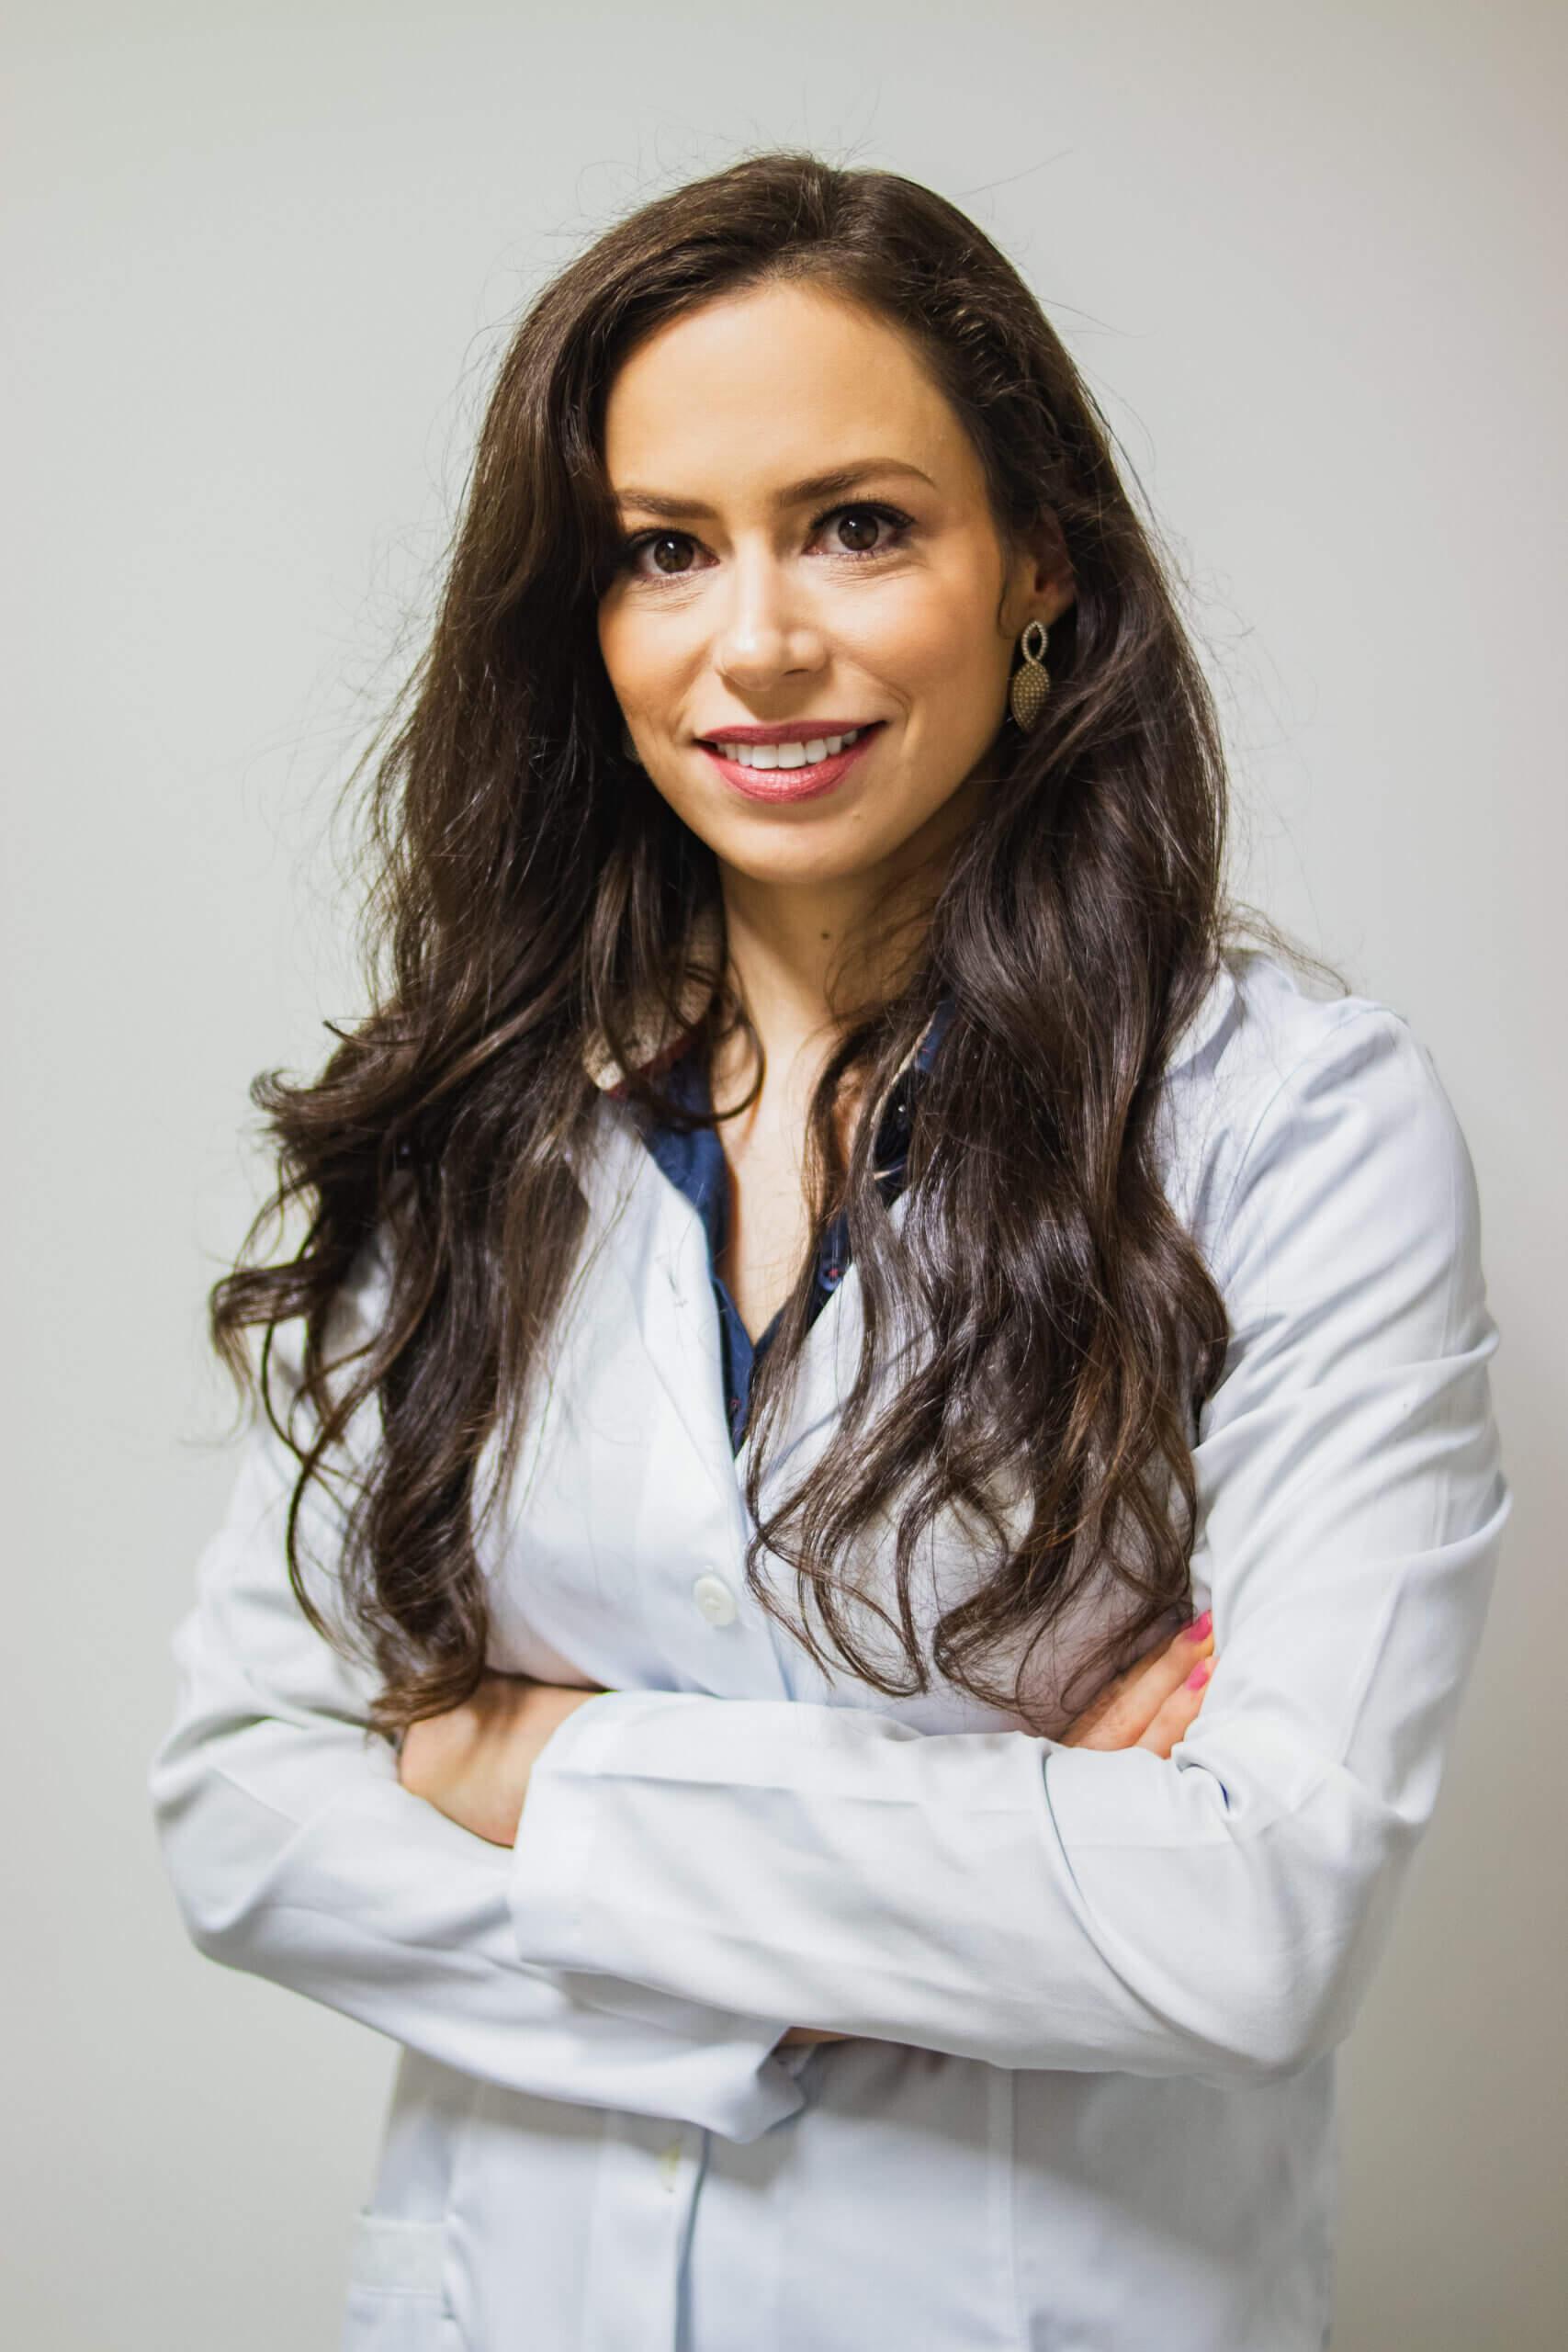 Dra. Kenia